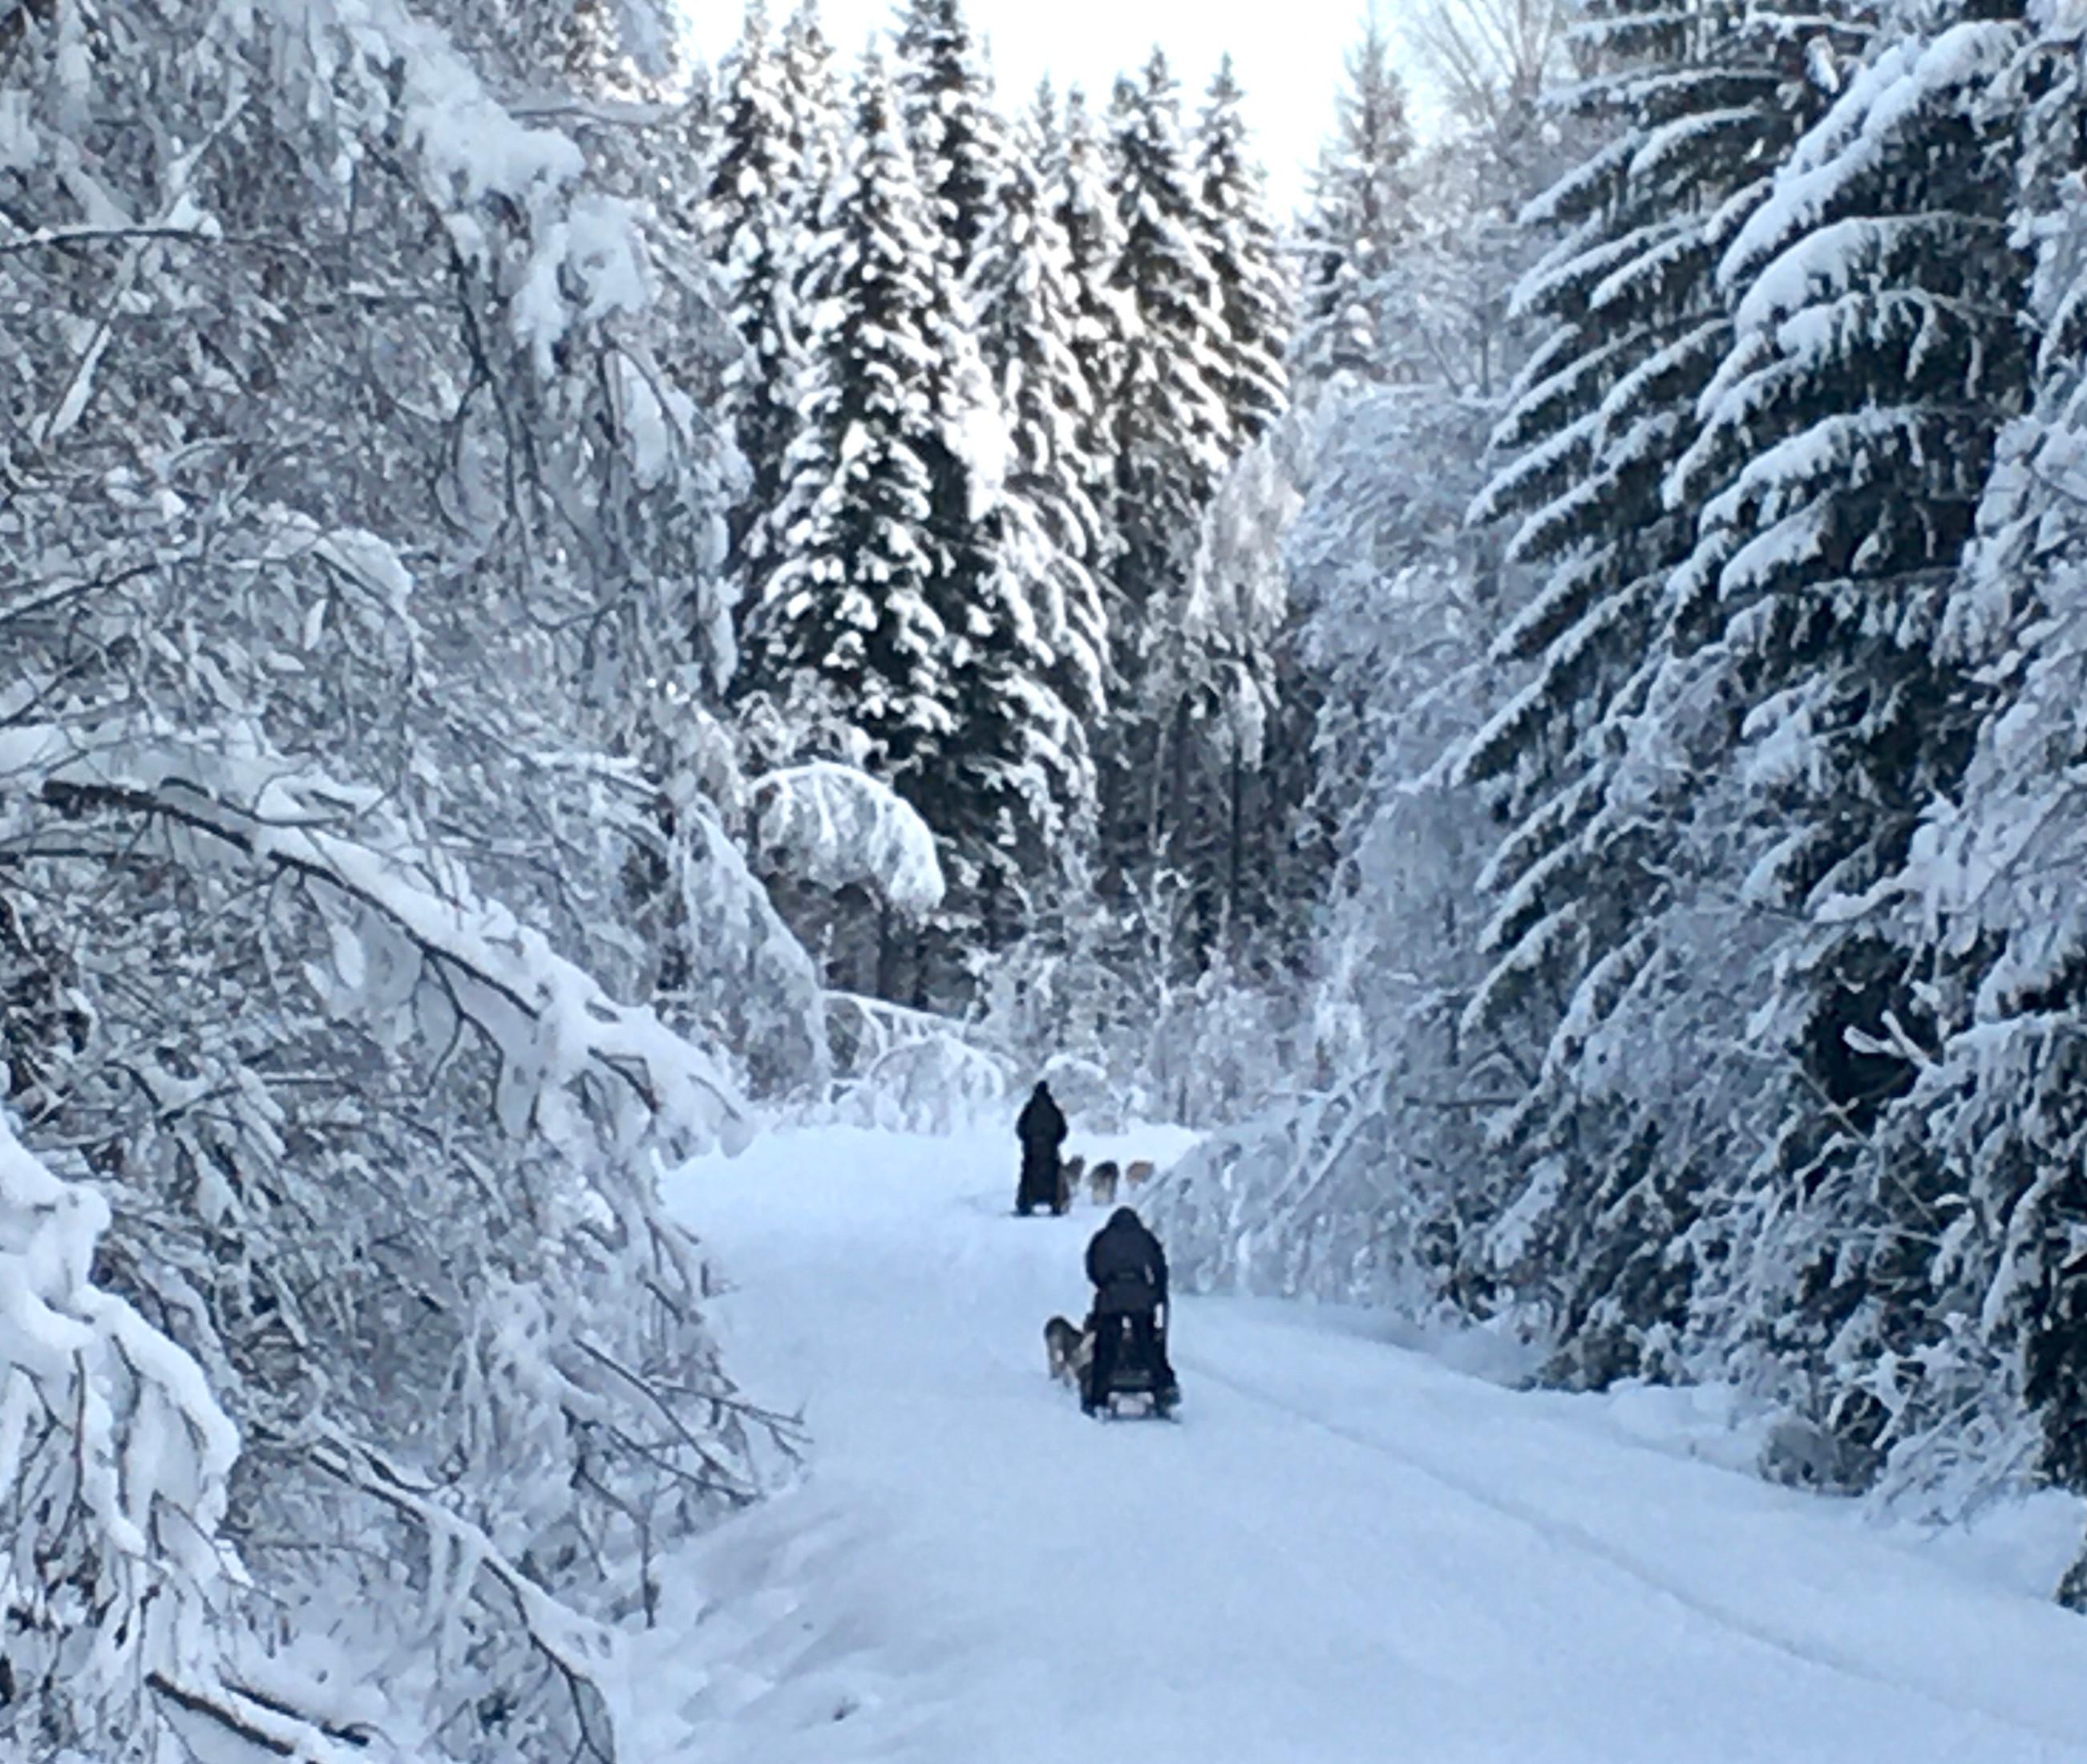 One week Arctic Experience exclusive